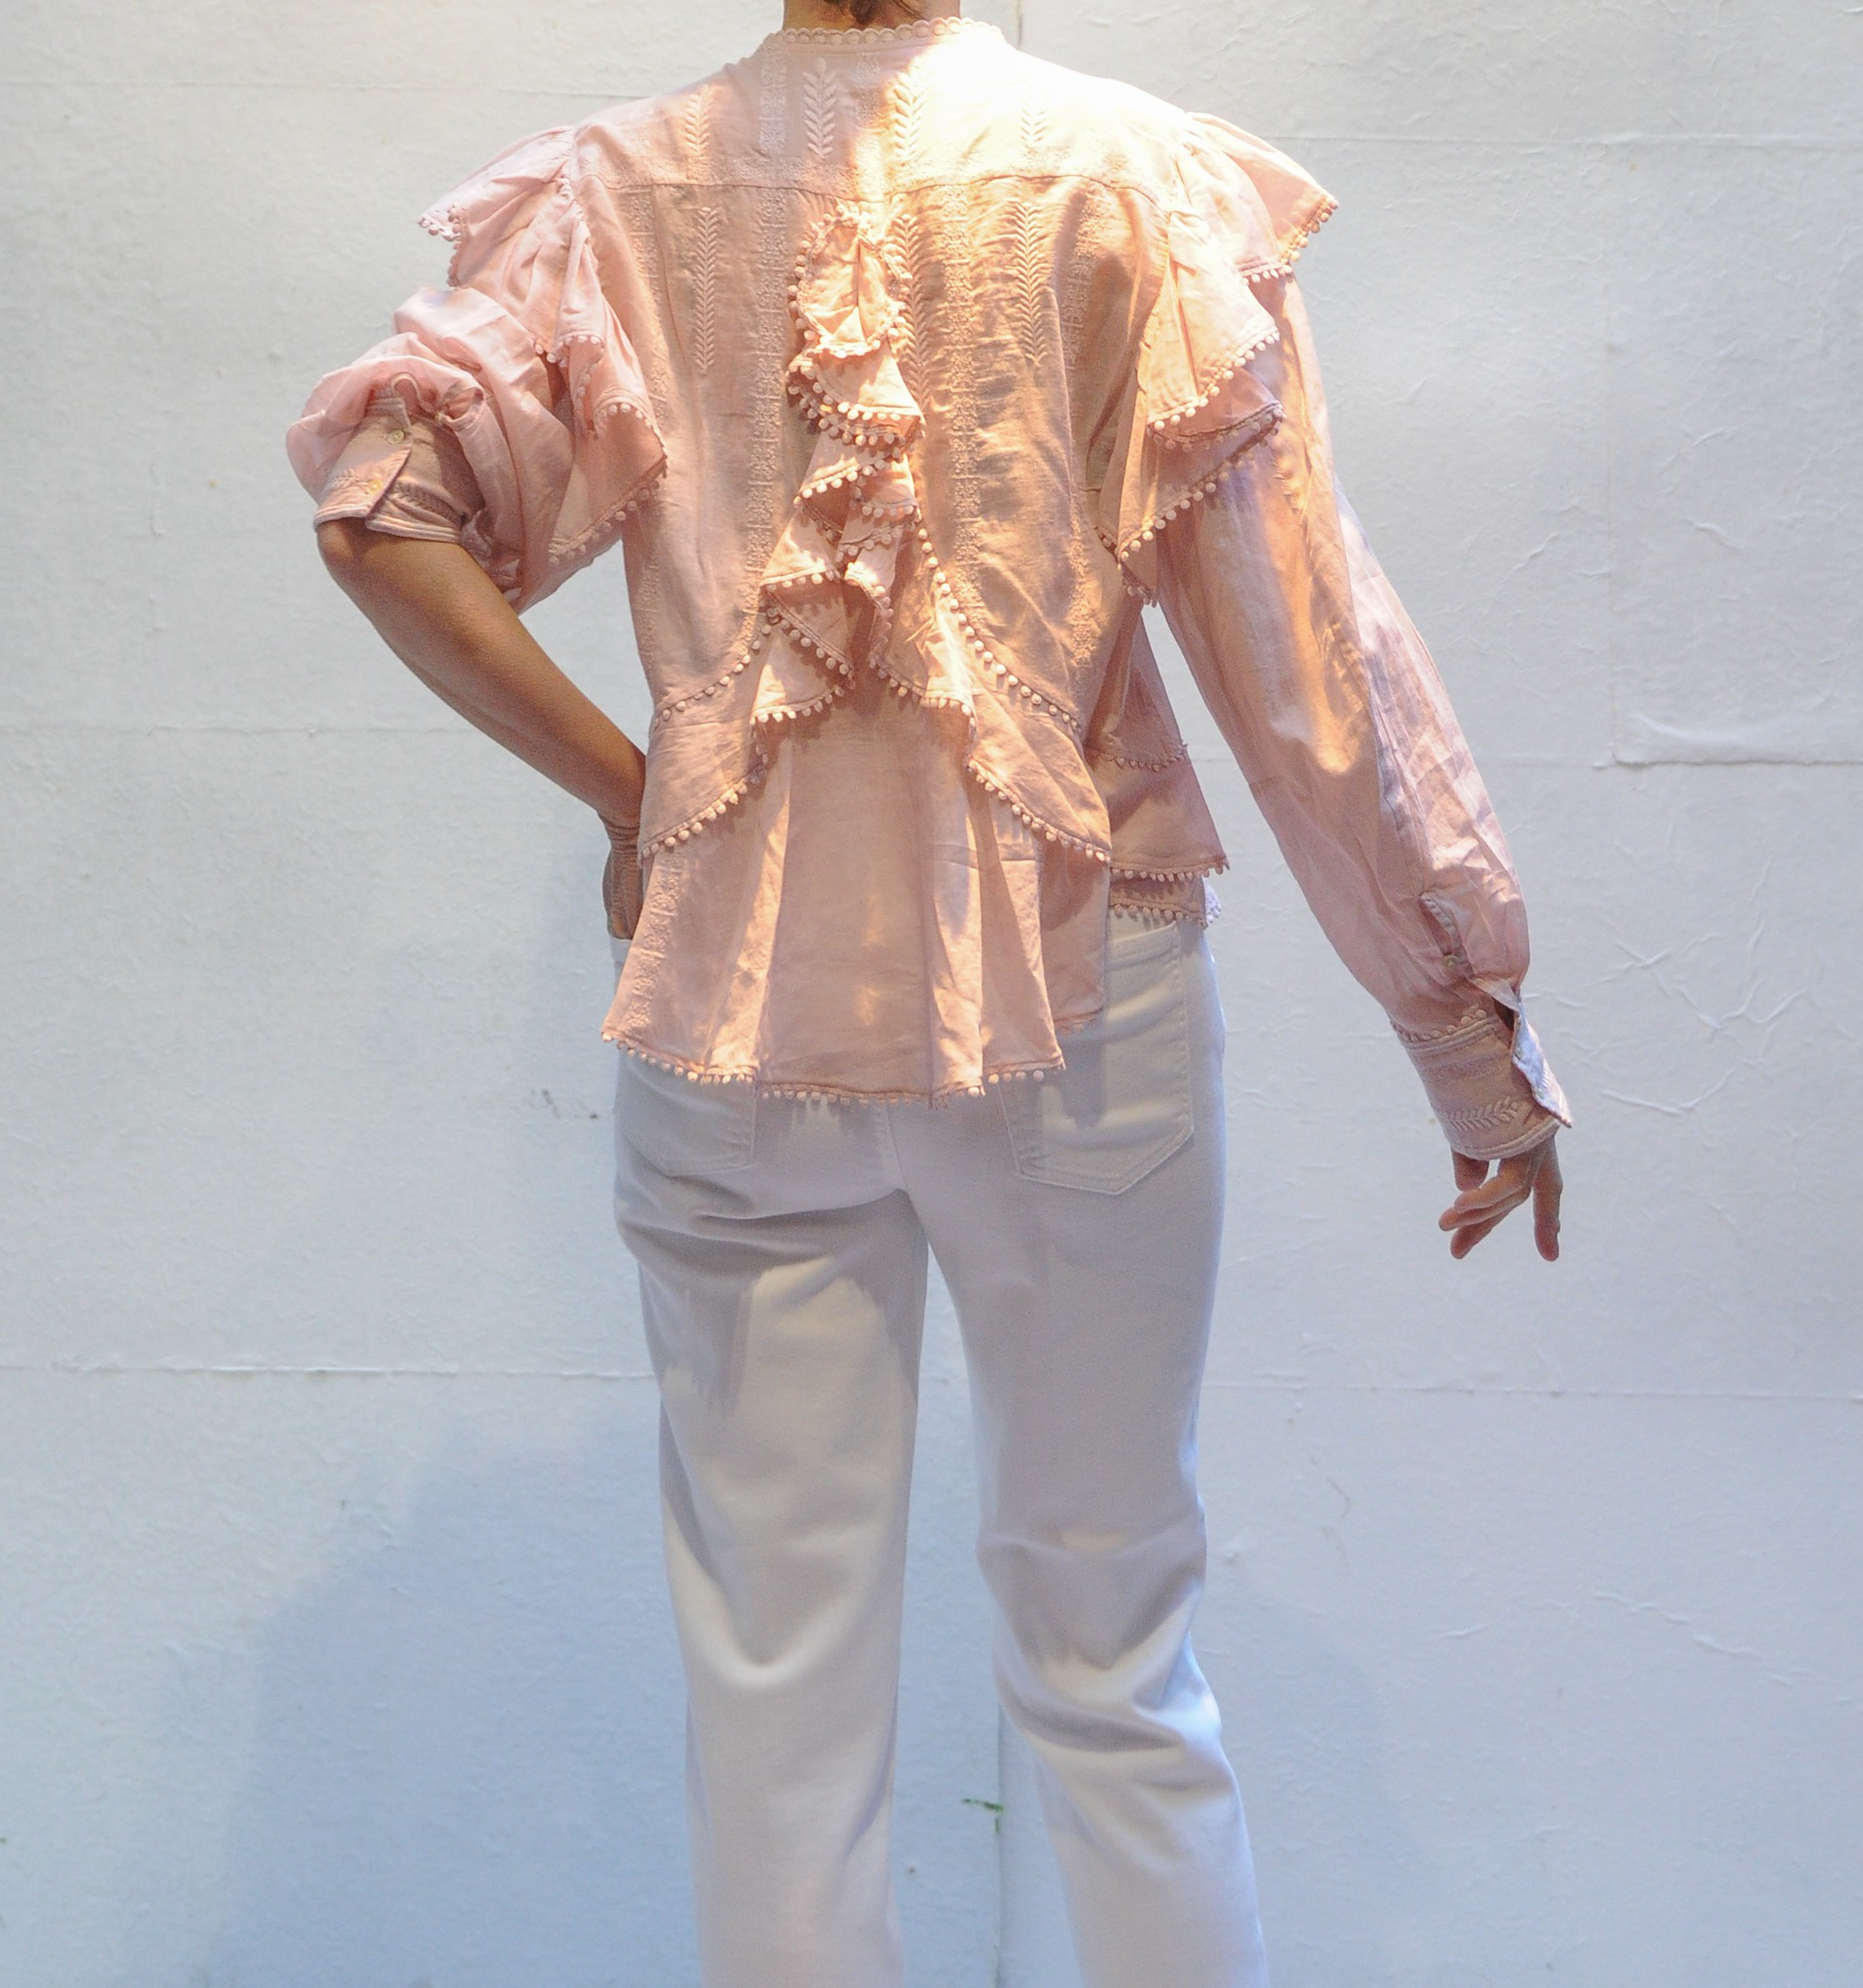 e5d1e3a63d7df ALEA cotton shirt with embroidered ruffles Isabel Marant Etoile